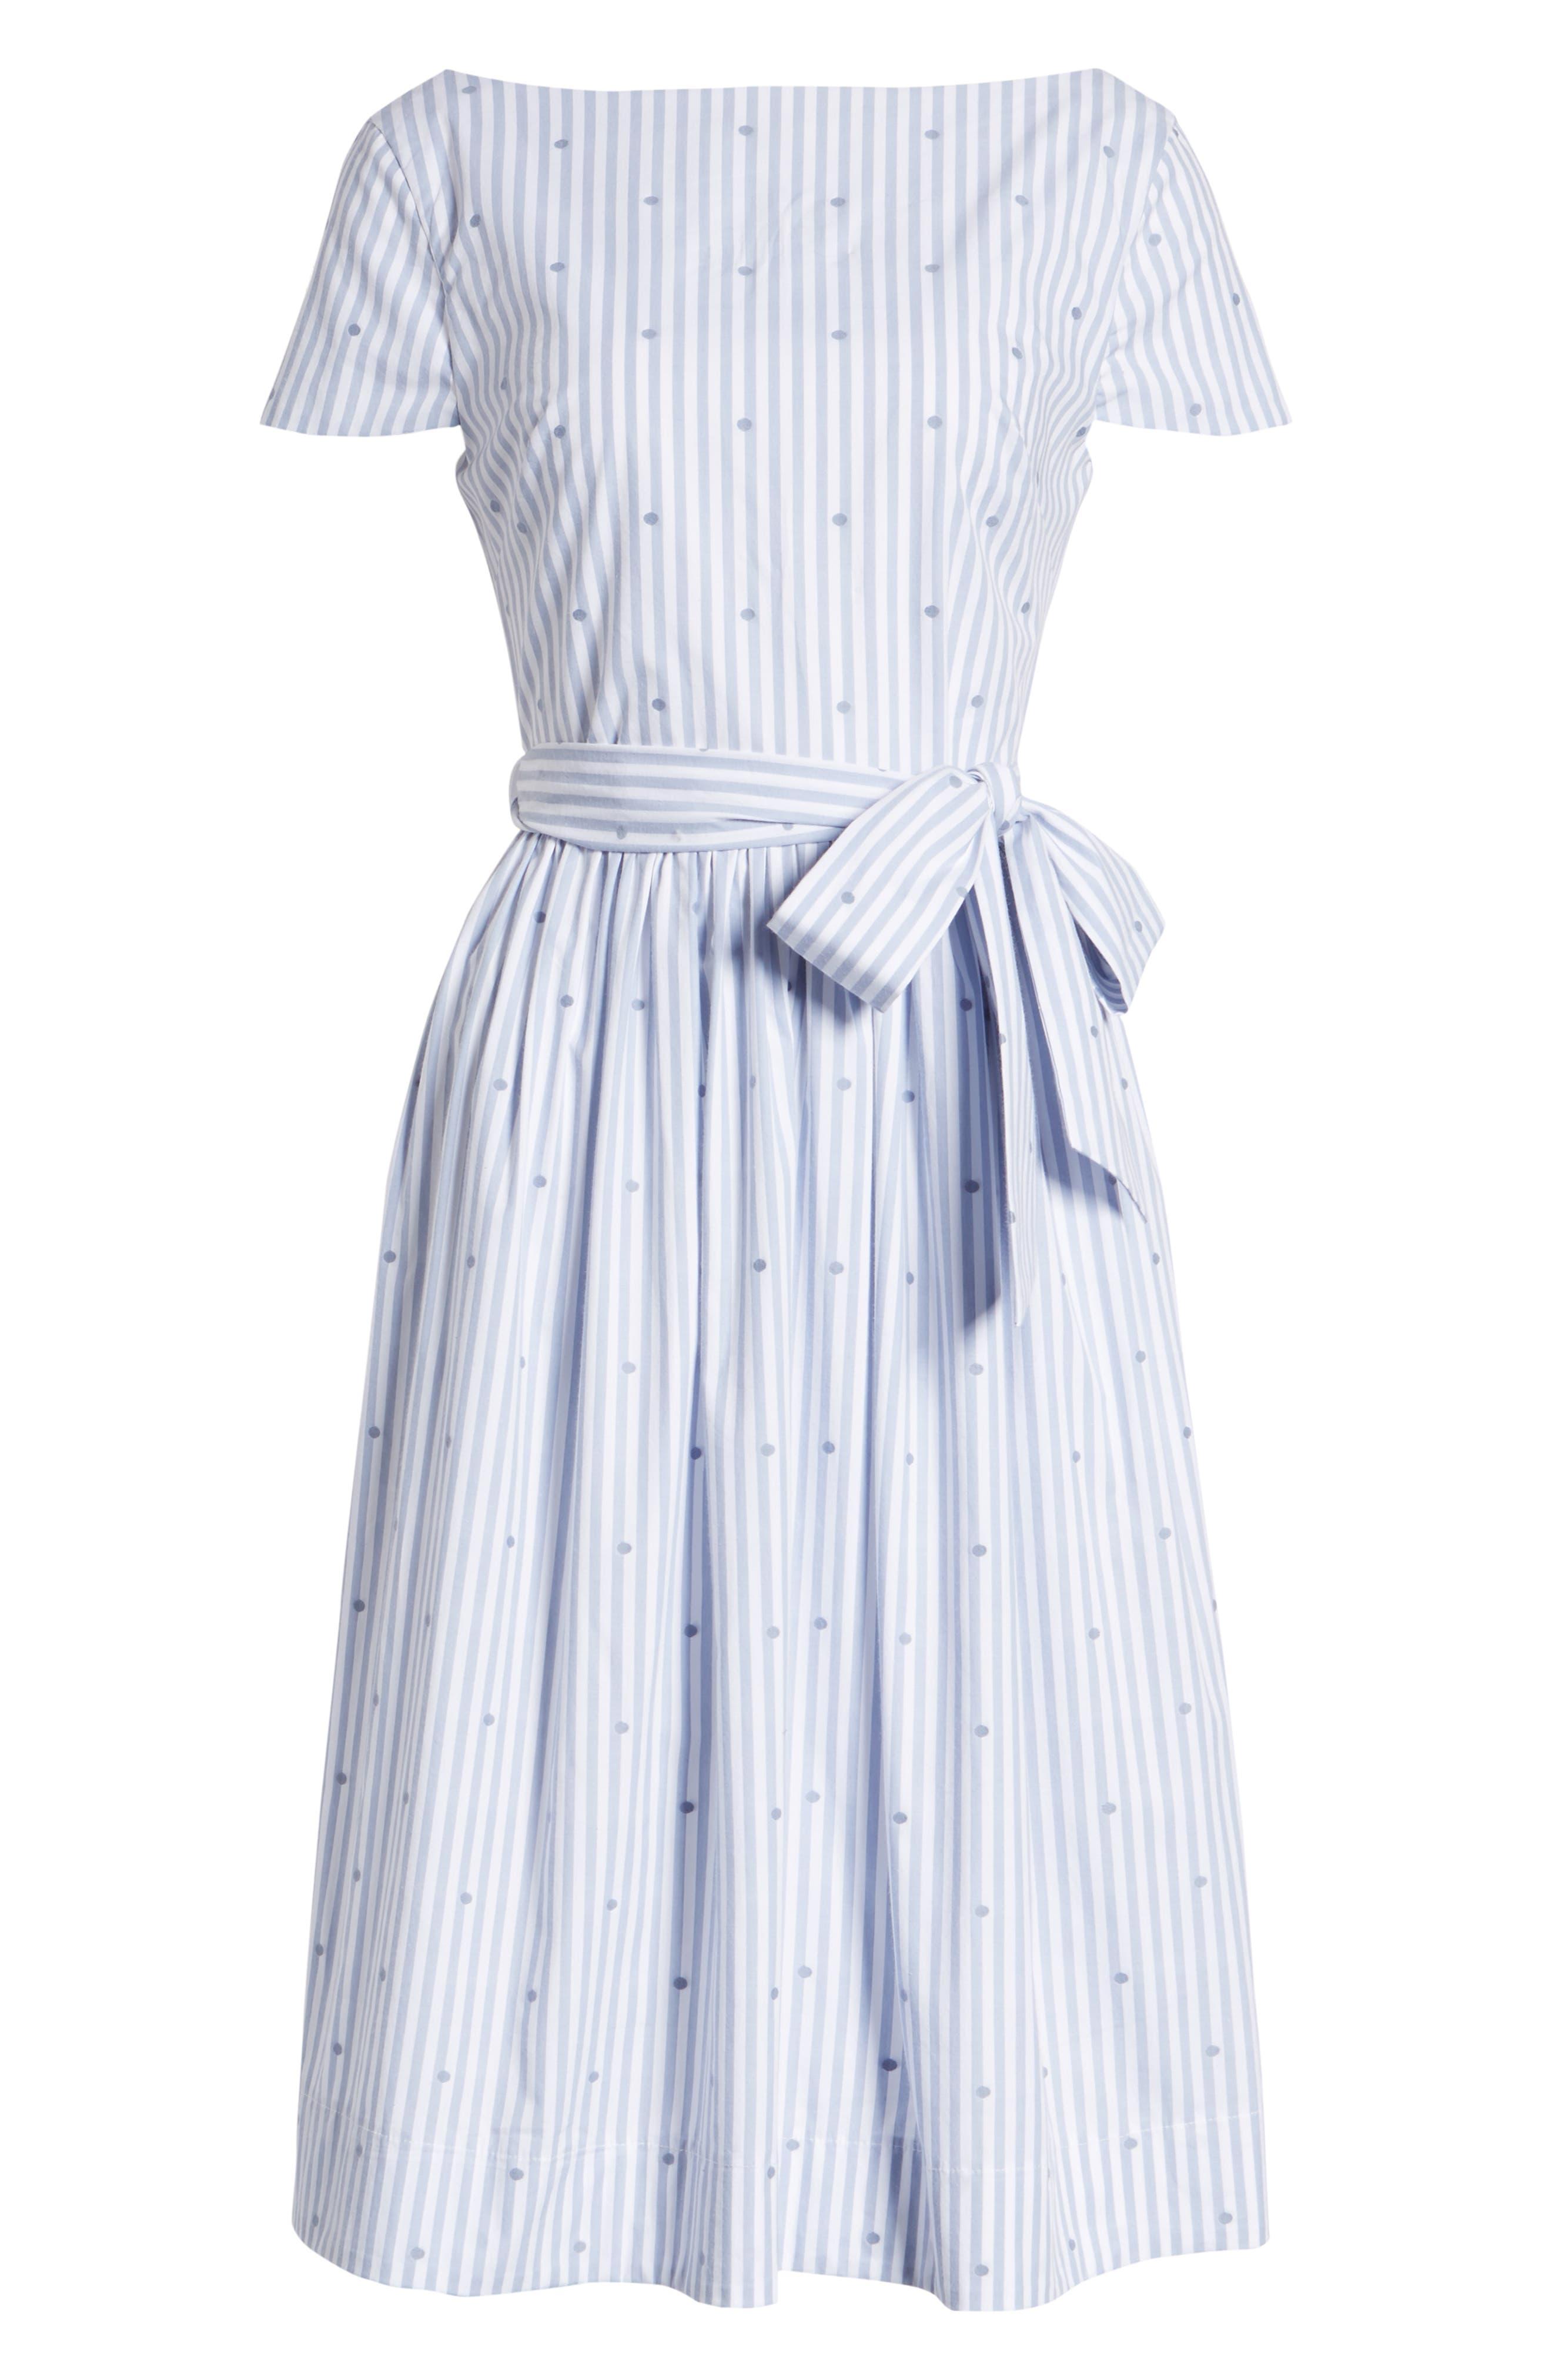 Stripe & Dot Cotton Dress,                             Alternate thumbnail 6, color,                             400